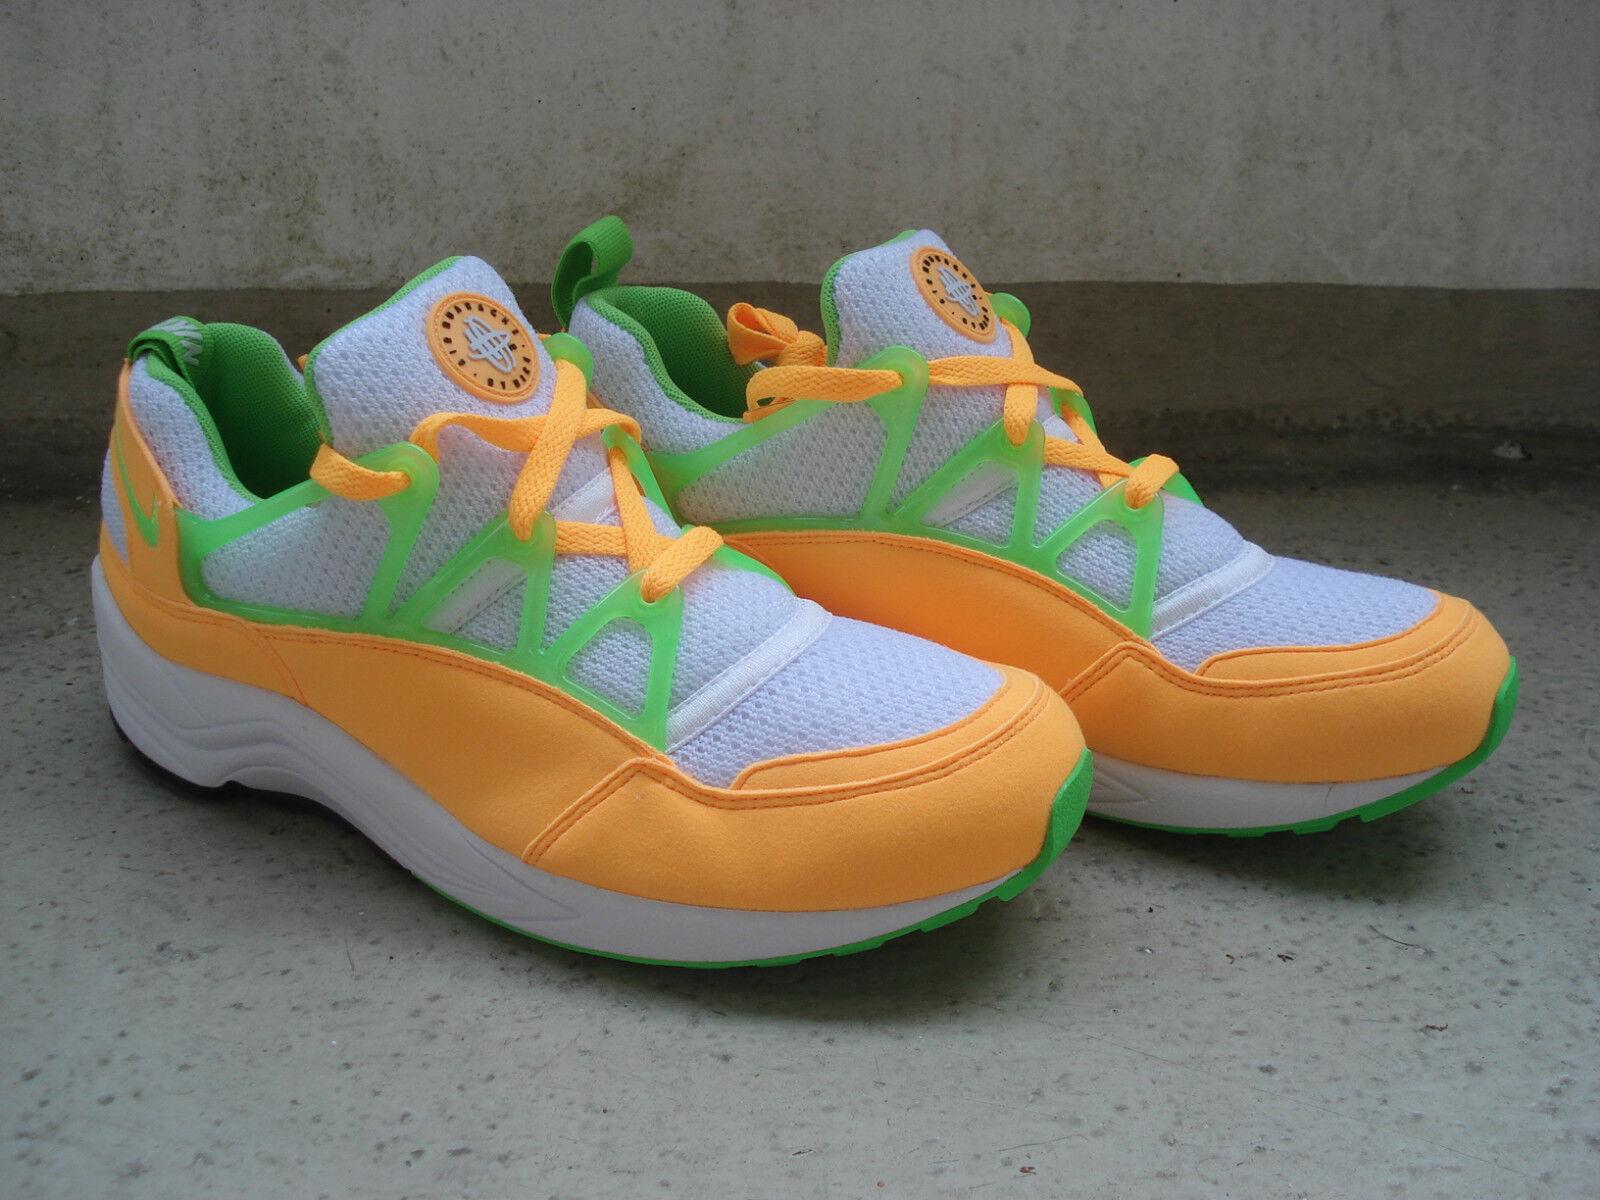 Nike Air Huarache Light Mango/Action 42 Atomic Mango/Action Light Grün-Weiß d0af32